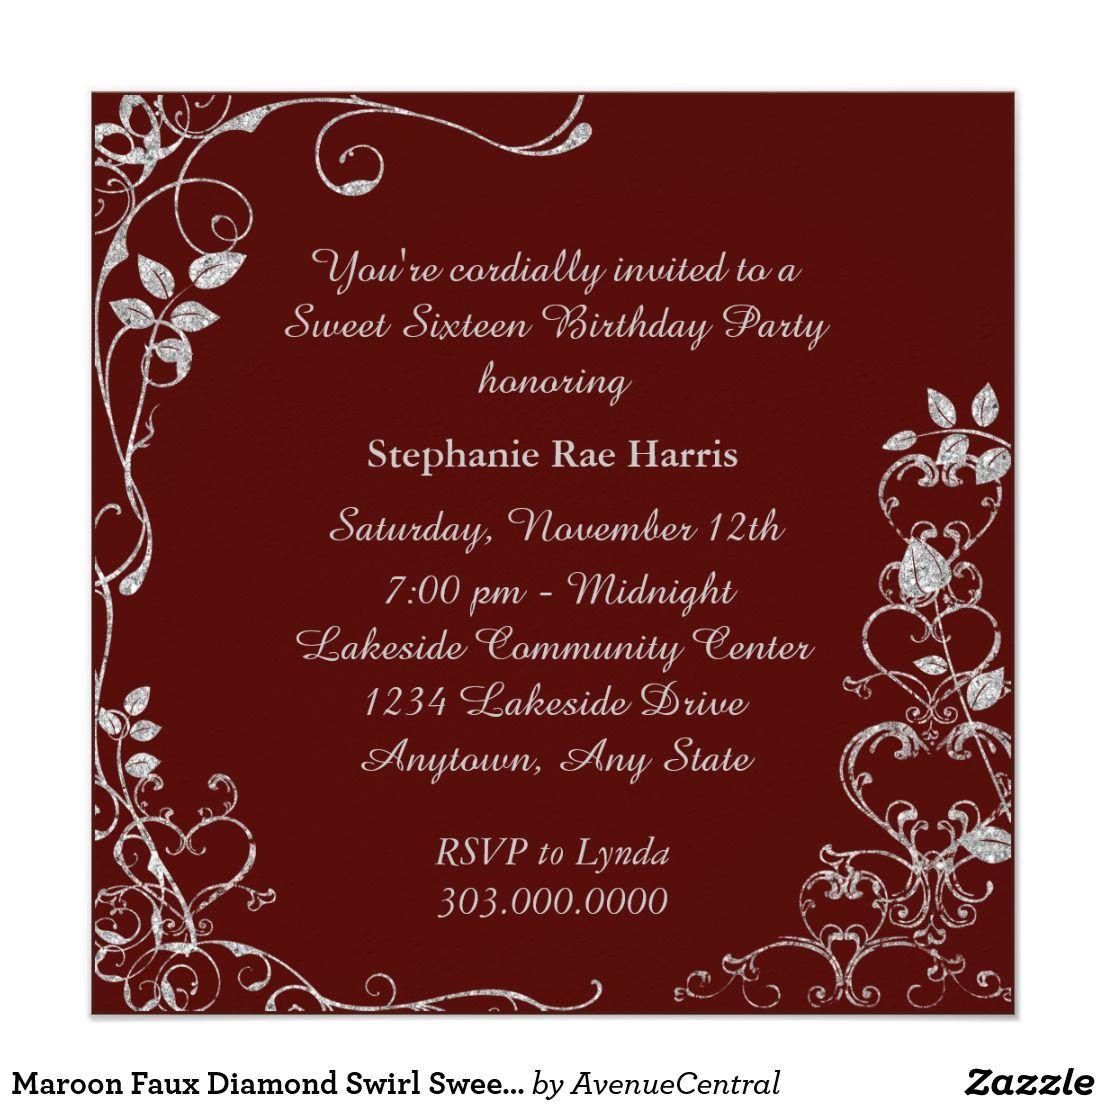 Maroon Faux Diamond Swirl Sweet 16 Birthday Party Invitation ...